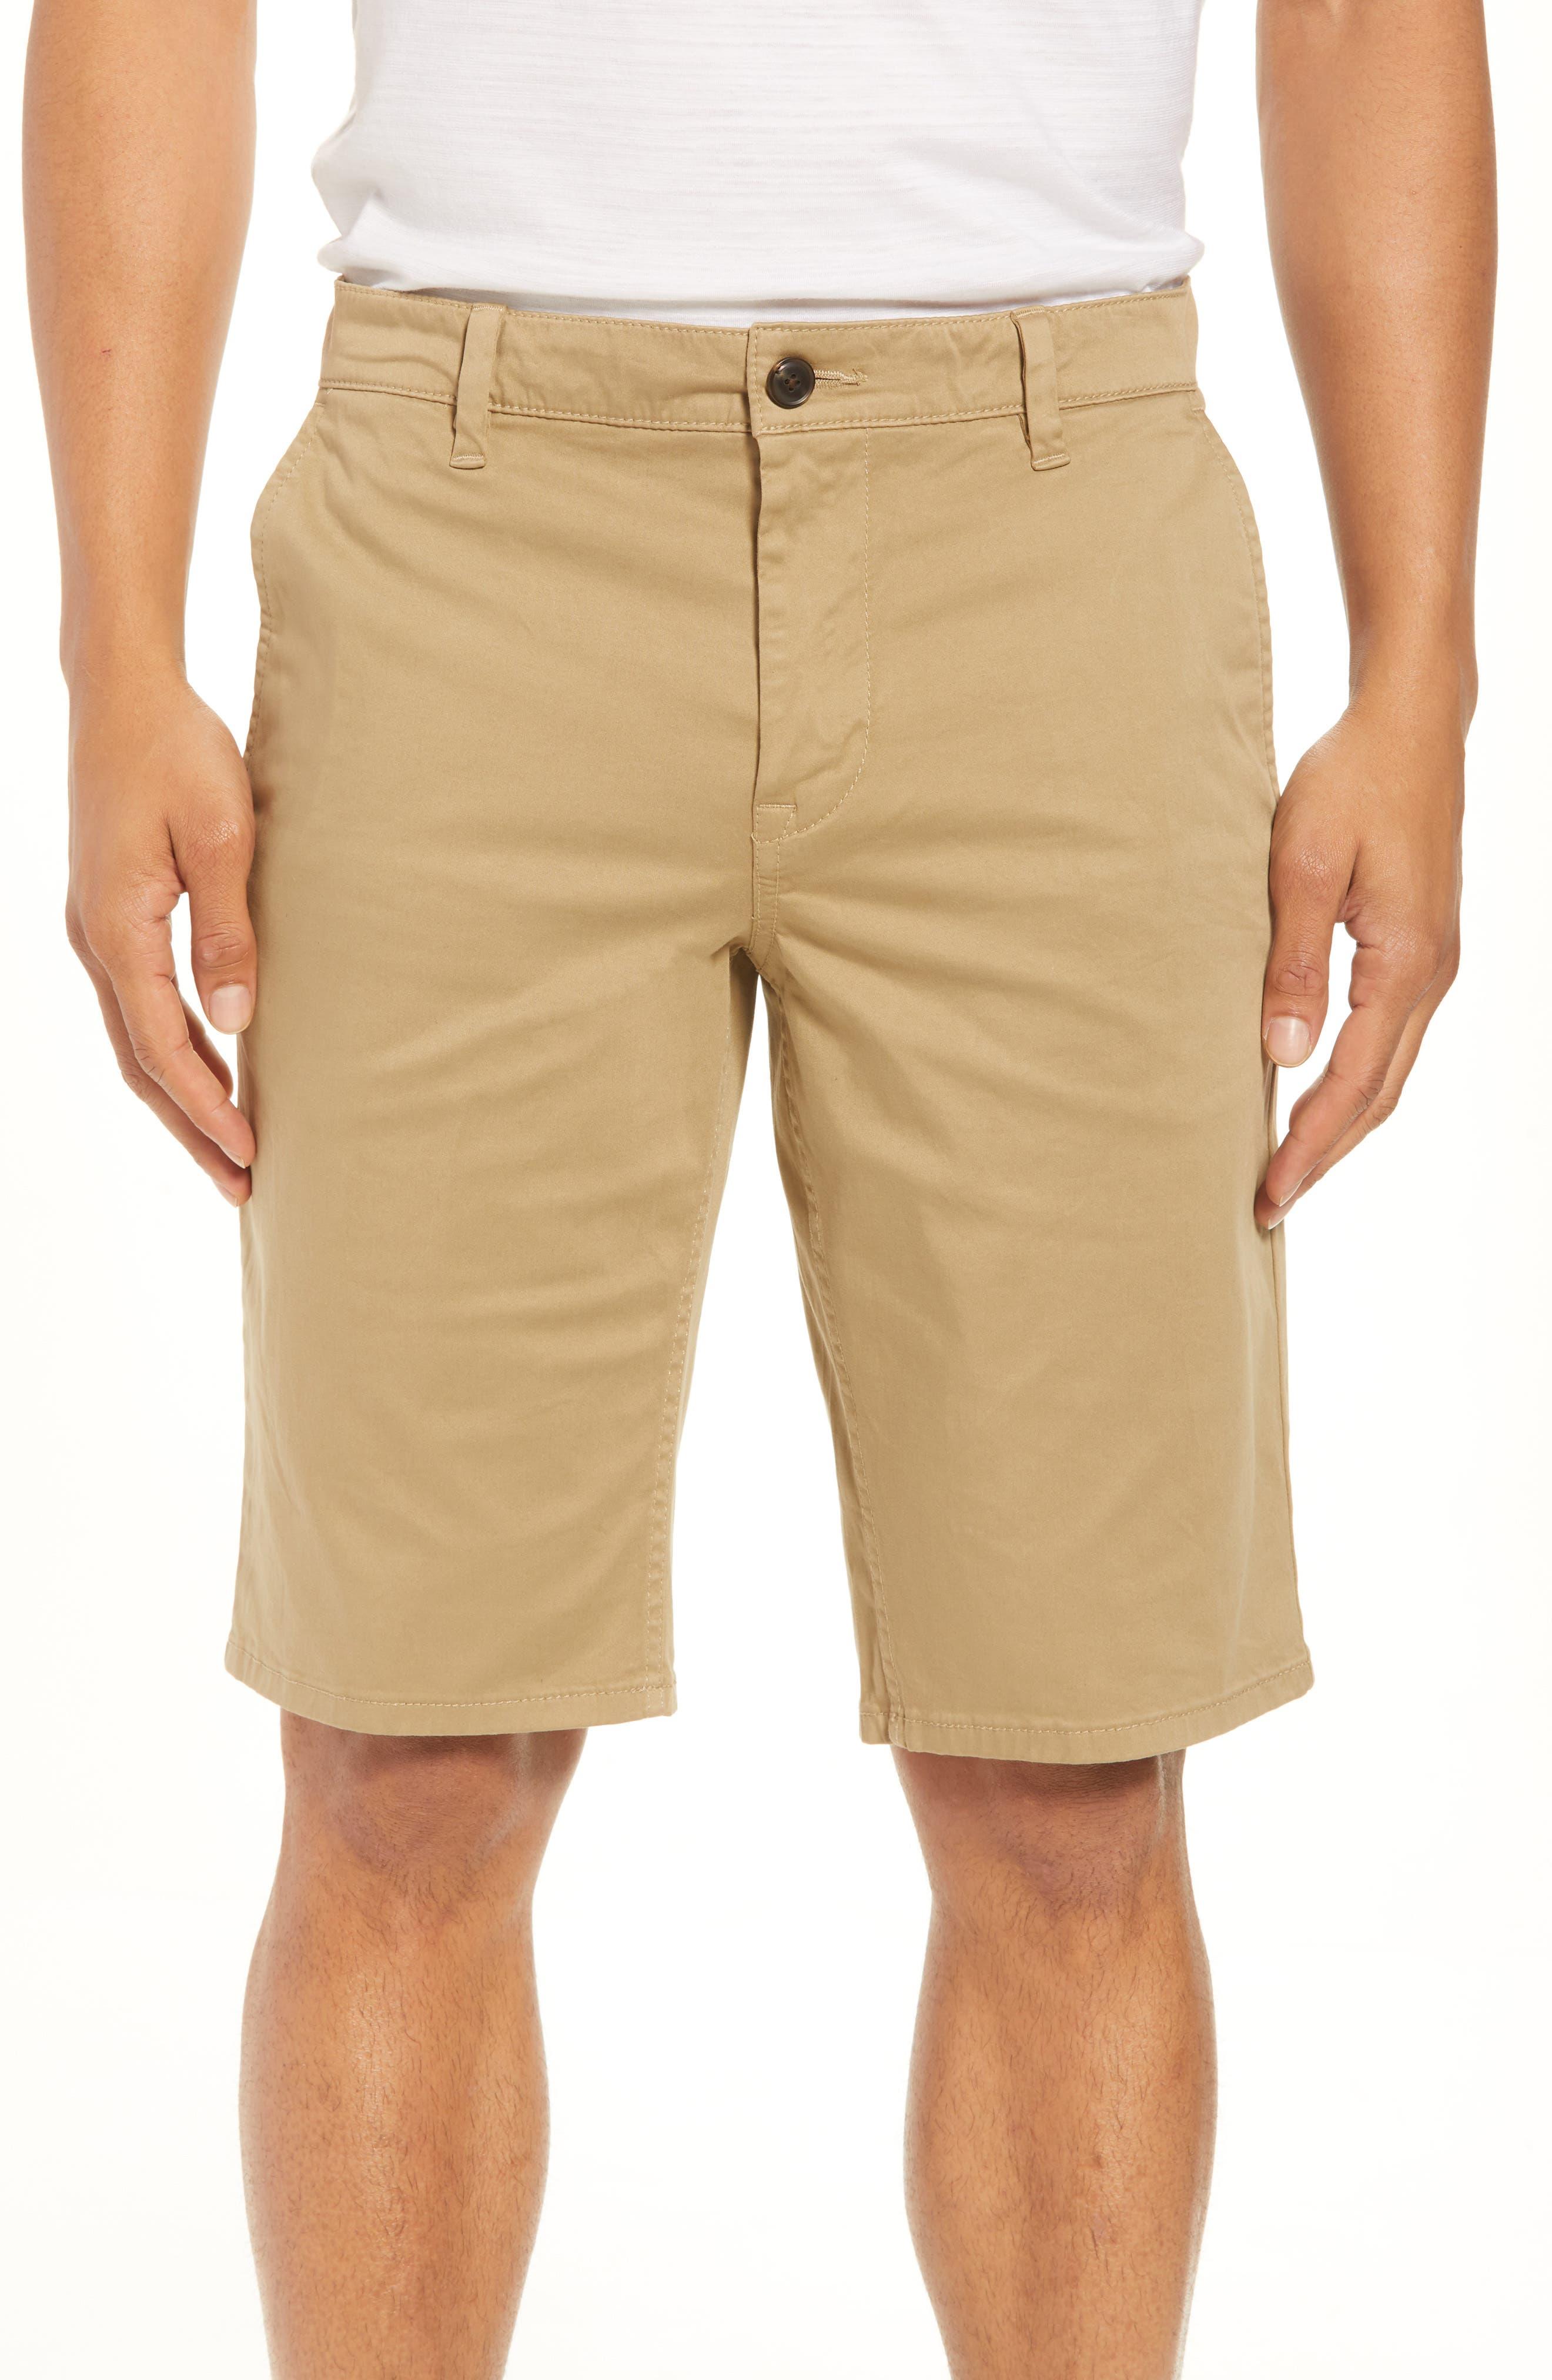 Slim Fit Shorts,                         Main,                         color, 200